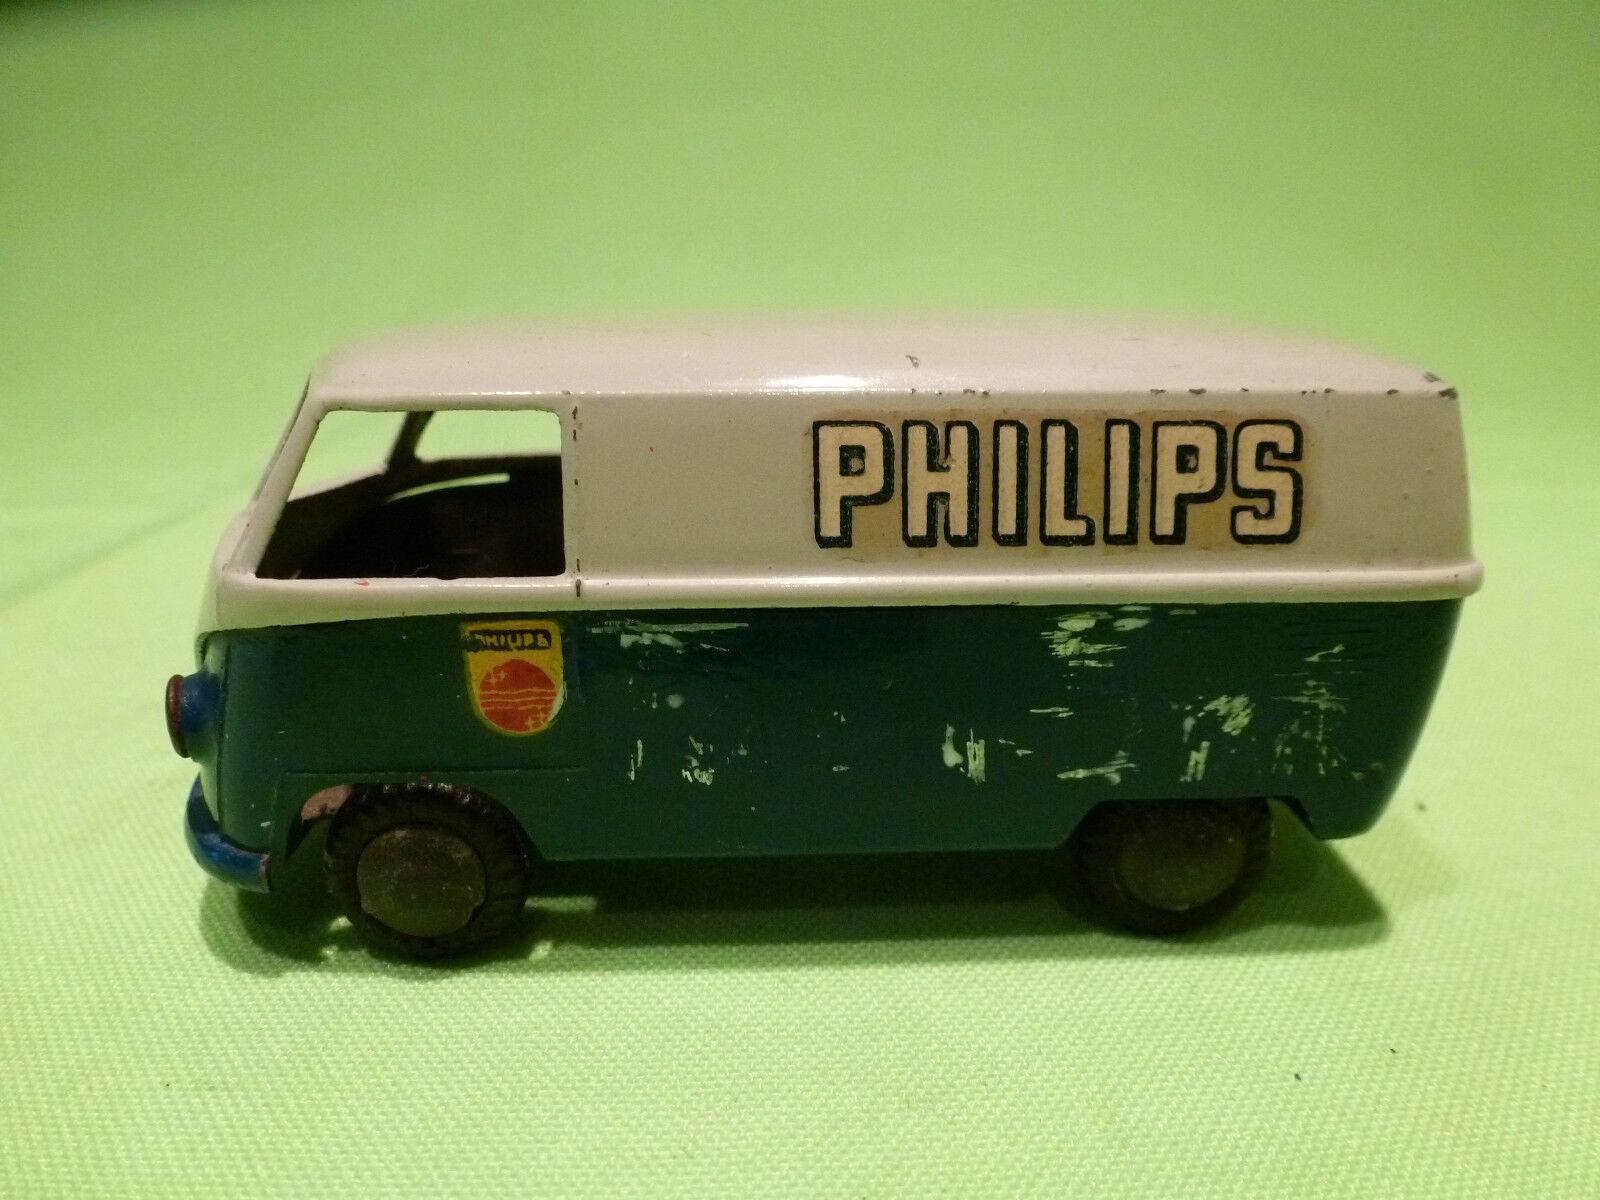 TEKNO DENMARK    1:43   VOLKSWAGEN BUS  -  PHILIPS   - VW BUS   IN GOOD CONDITION f50d31